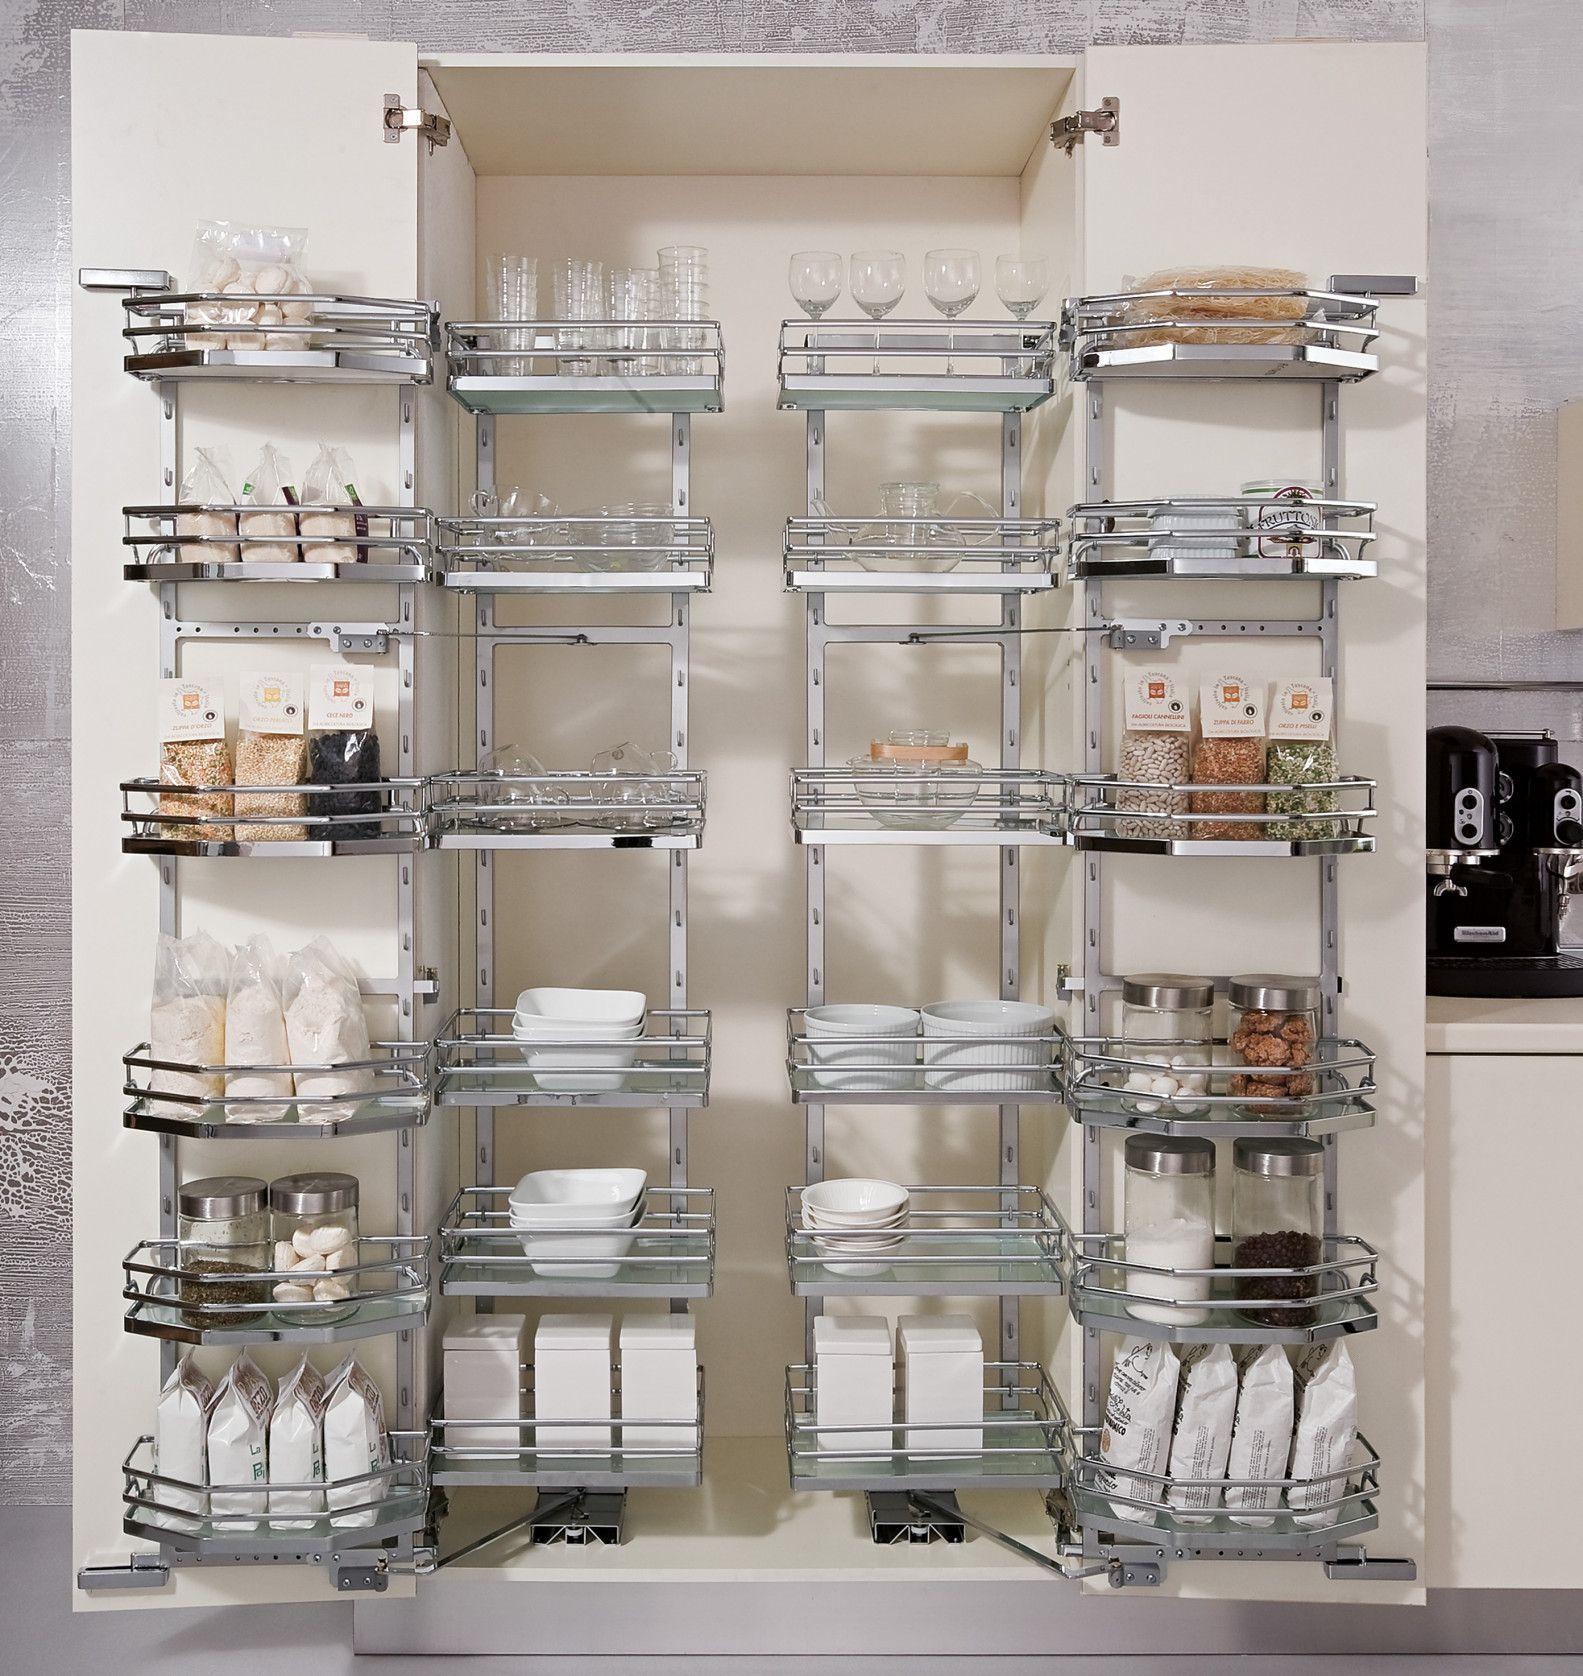 70 Metal Kitchen Pantry Cabinet Unique Kitchen Backsplash Ideas Check More At Ht Pantry Storage Containers Kitchen Cabinet Storage Unique Kitchen Backsplash